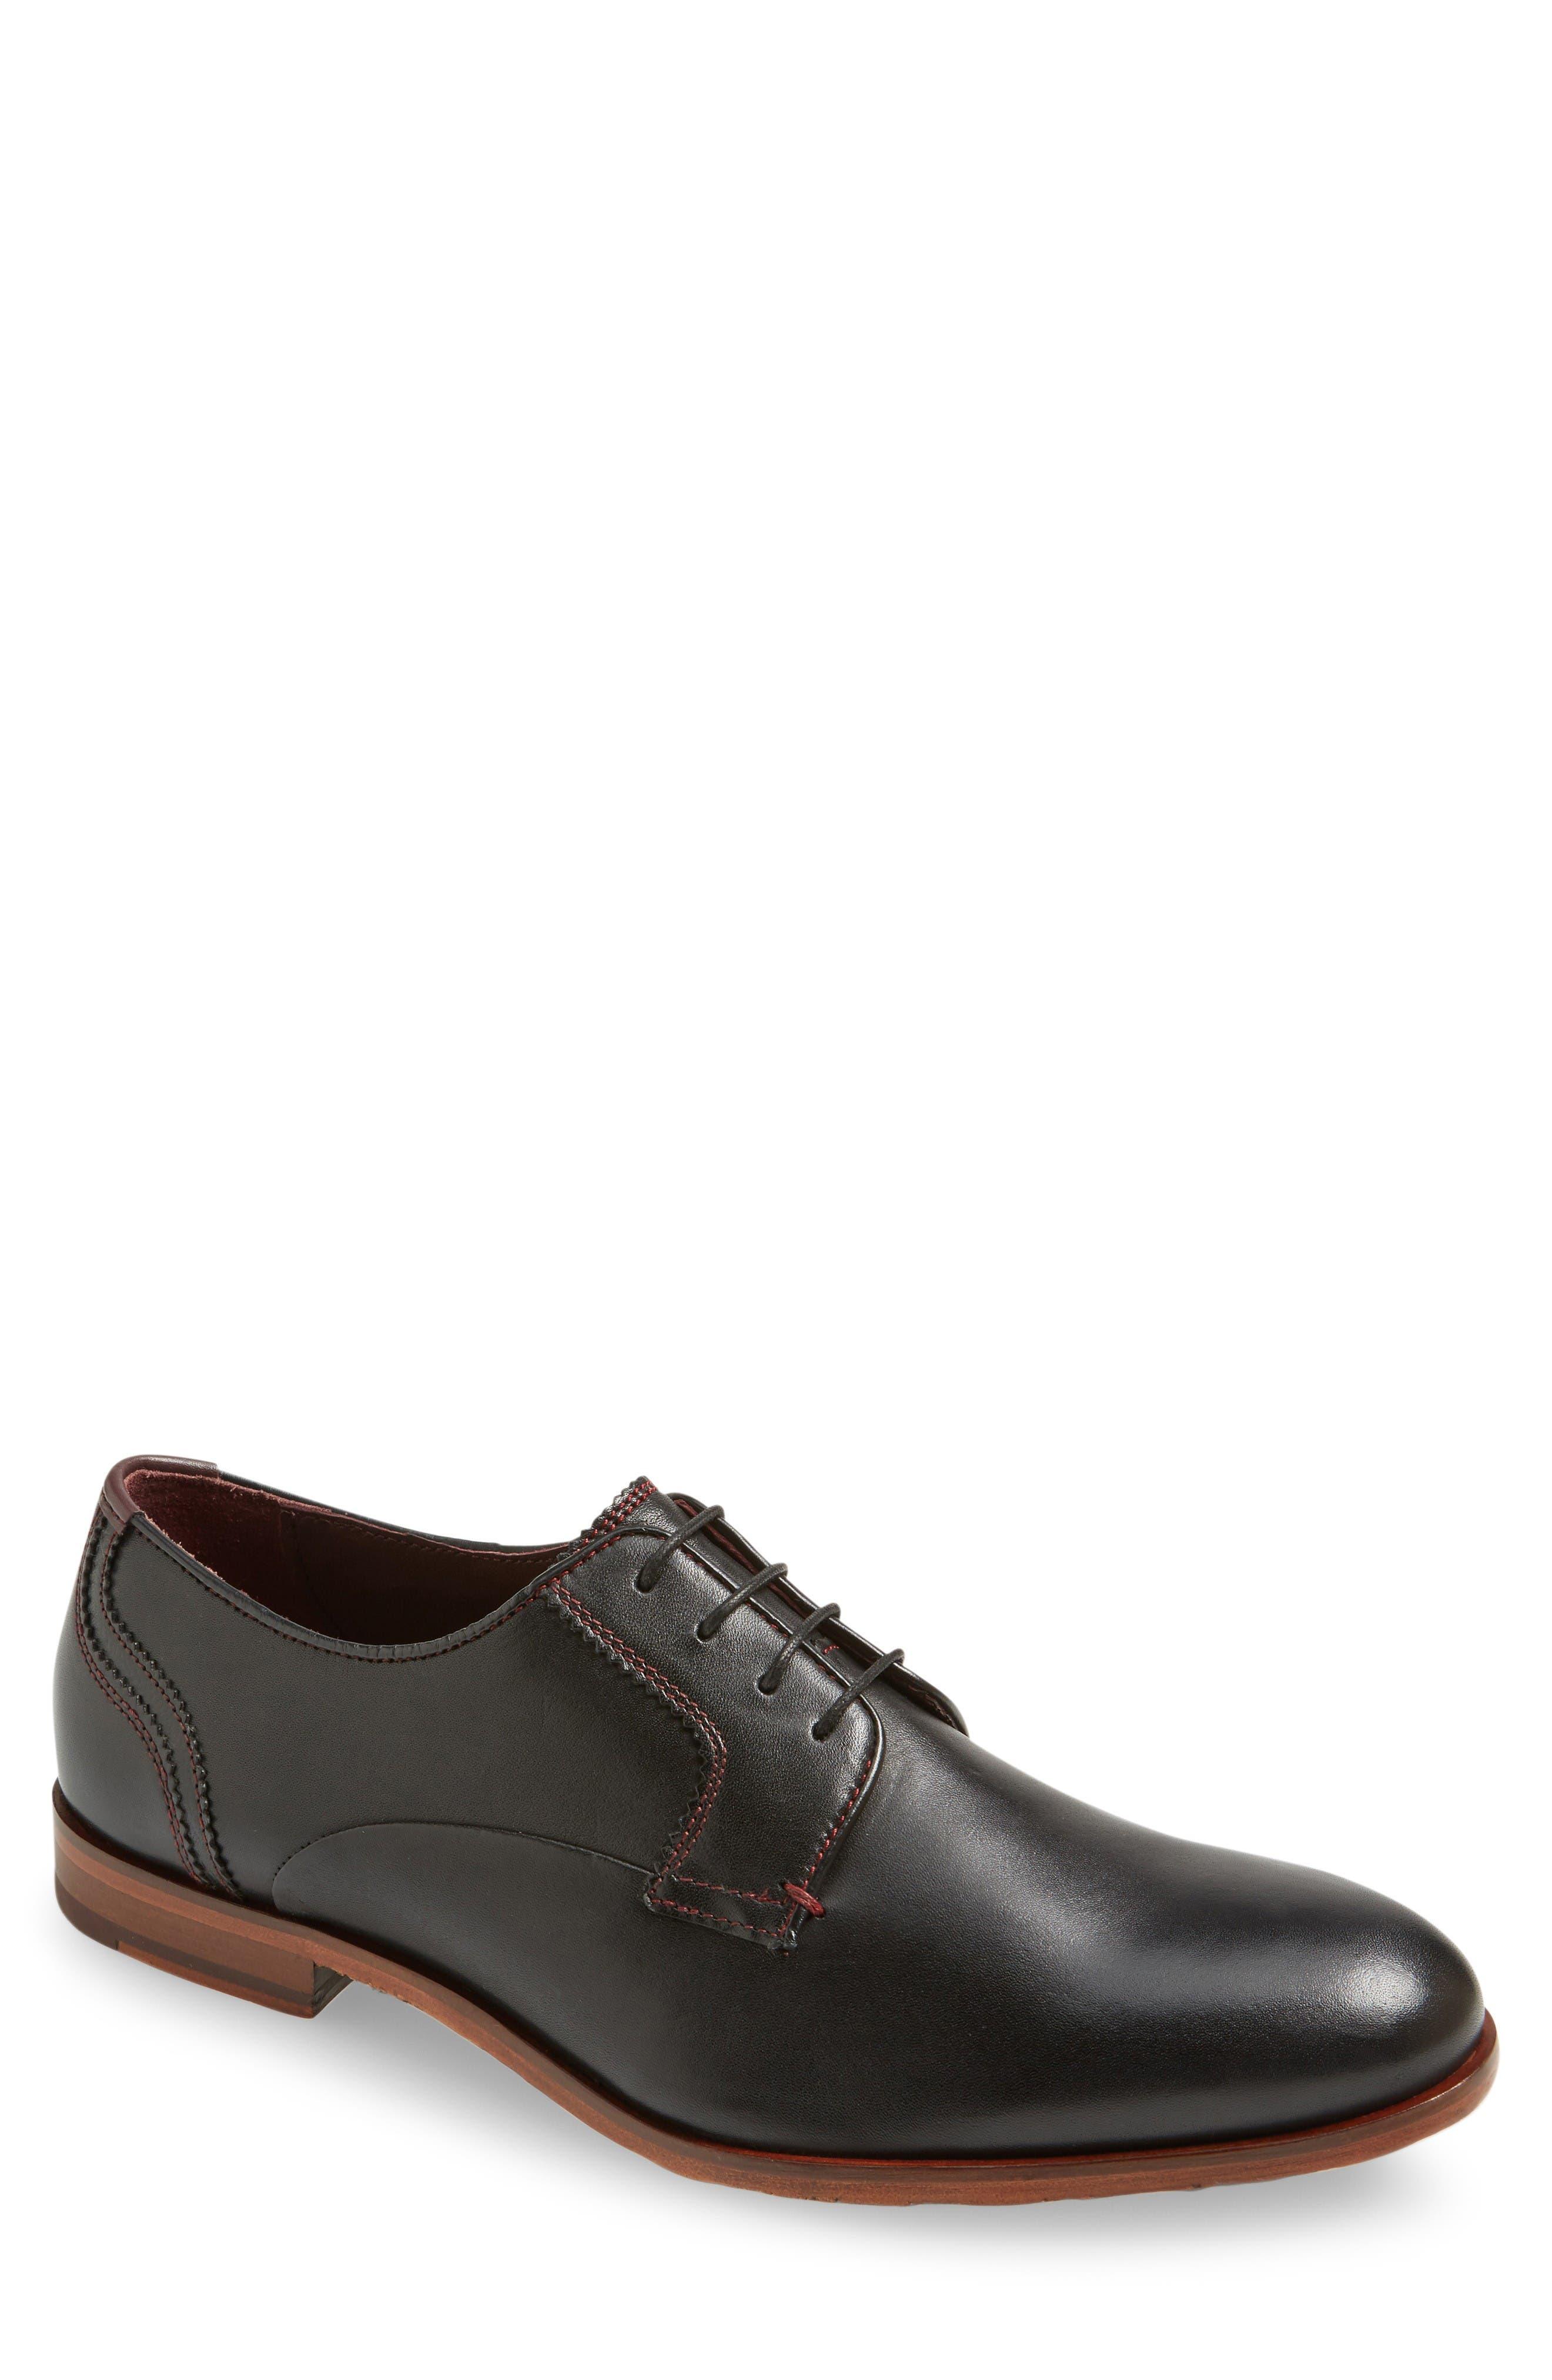 Iront Plain Toe Derby,                             Main thumbnail 1, color,                             Black Leather